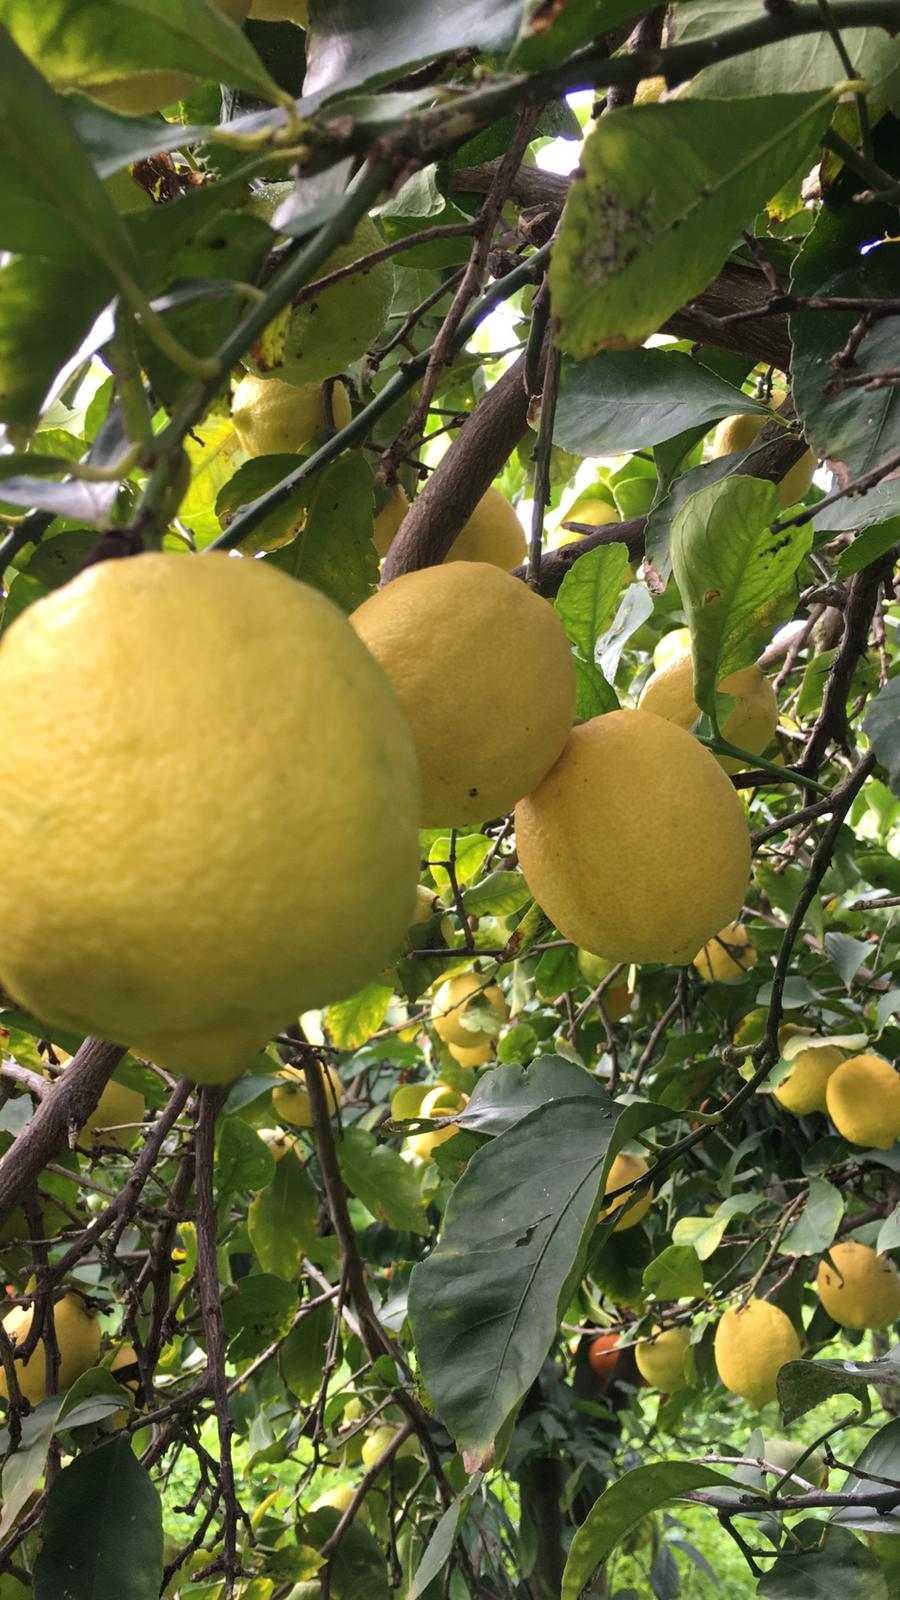 vendita-online-limoni-di-sicilia-palagonia